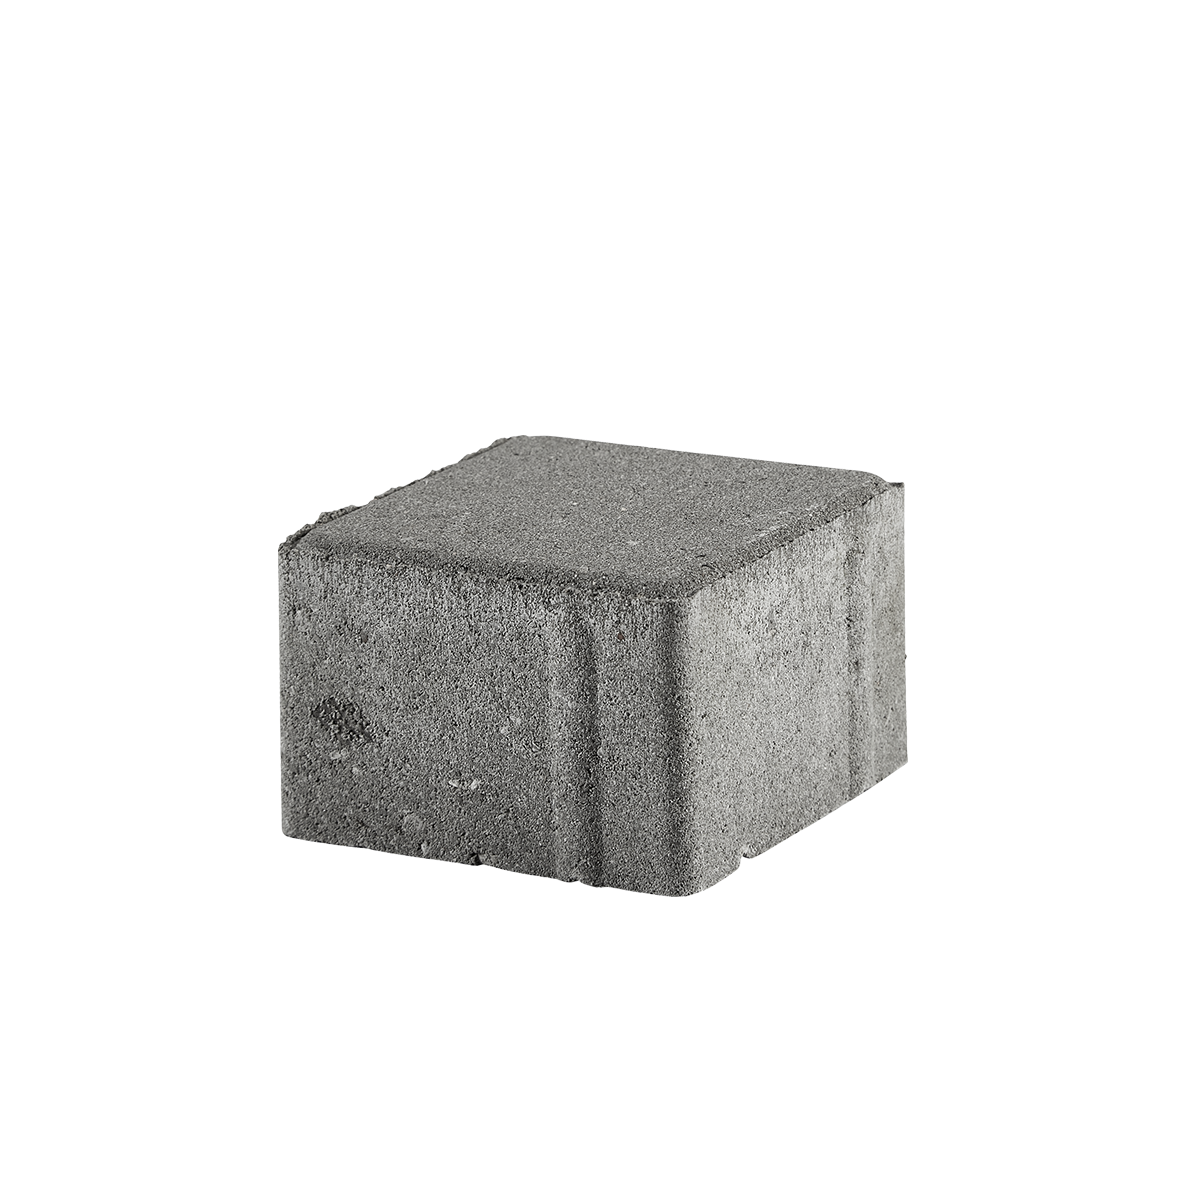 Kop/Betonbrosten 10x10x6 cm Grå